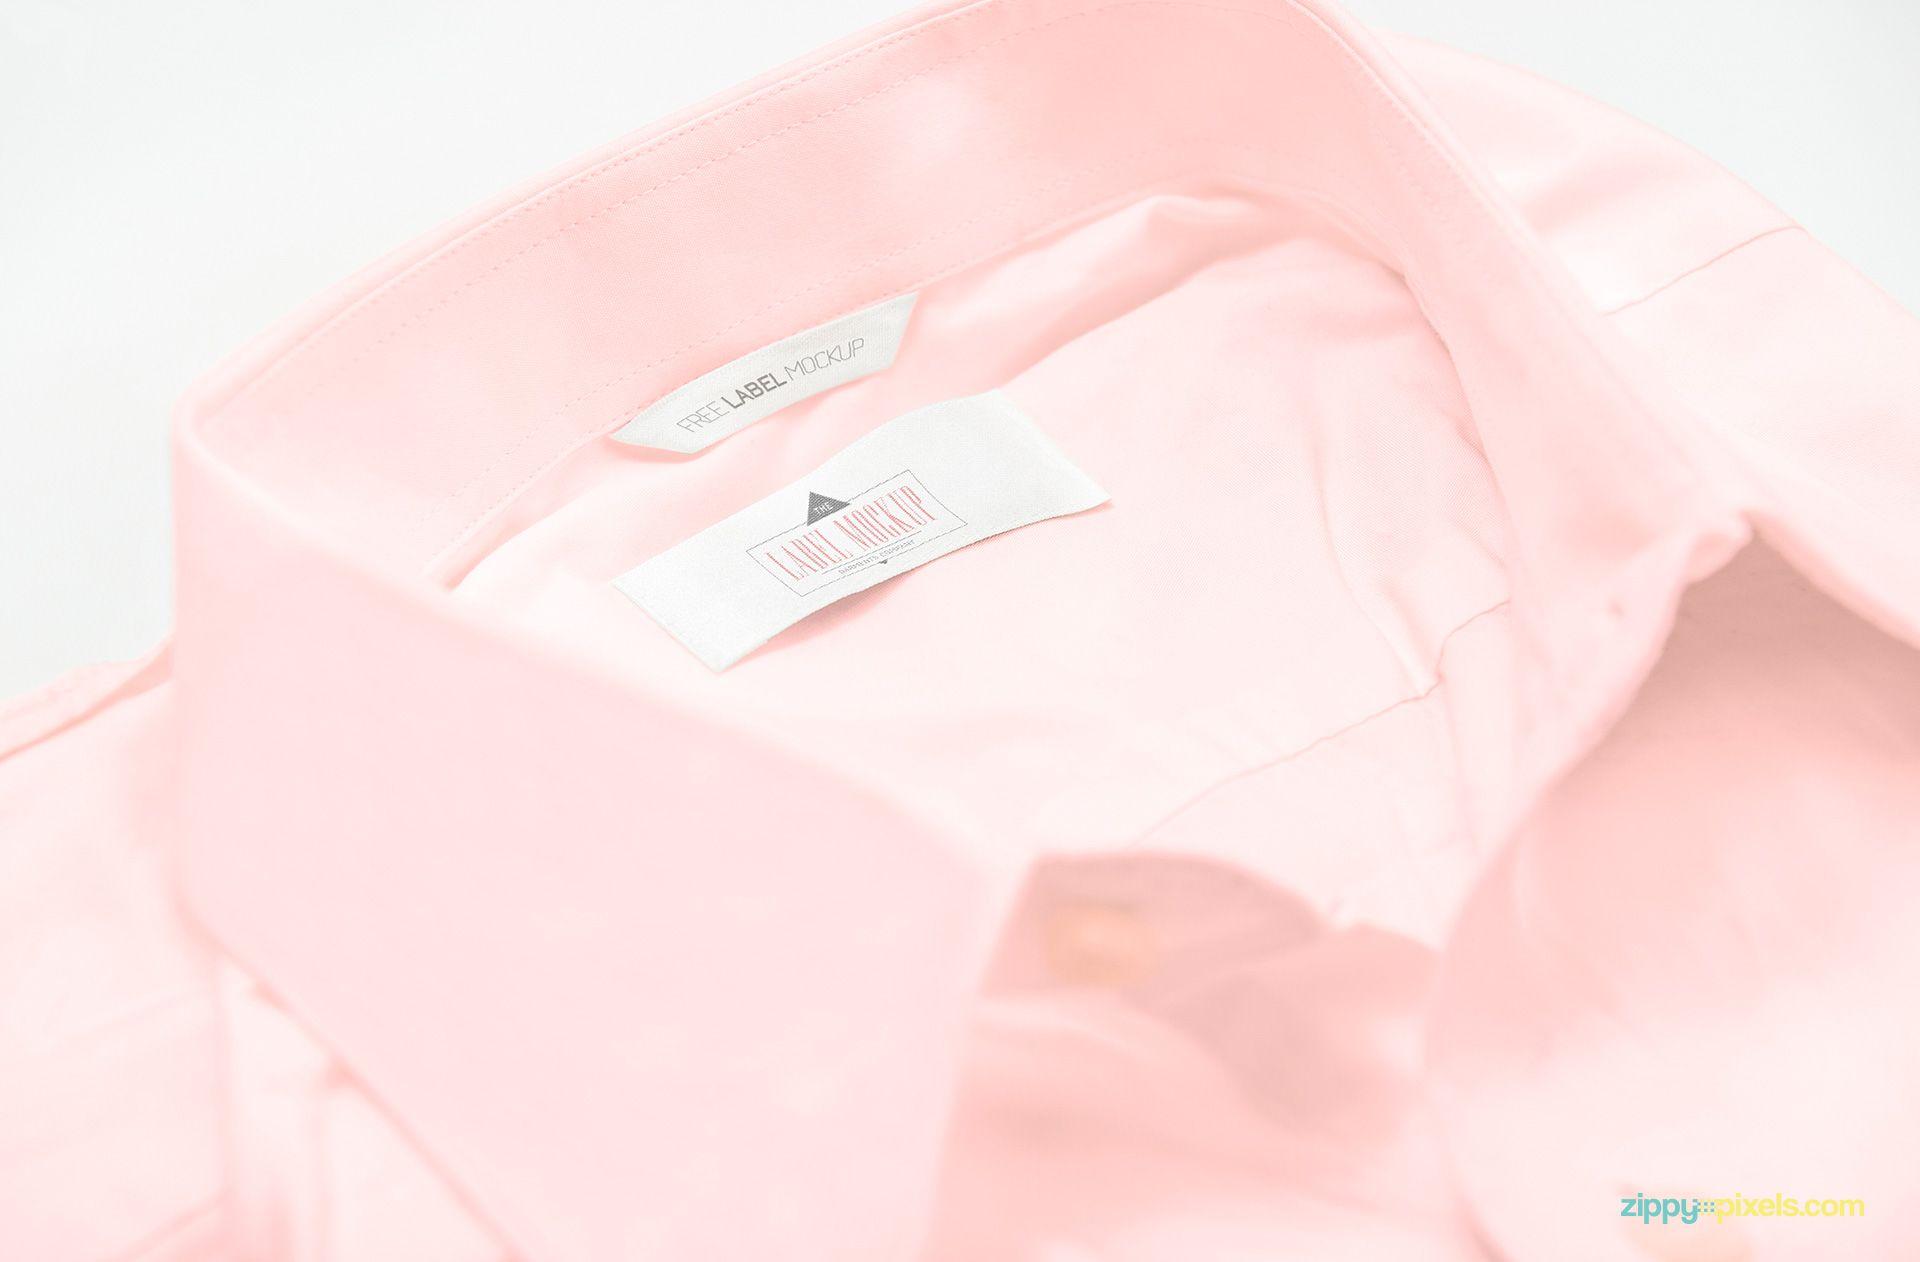 Download 2 Free Clothing Label Mockups Zippypixels Clothing Mockup Clothing Labels 10th Clothing